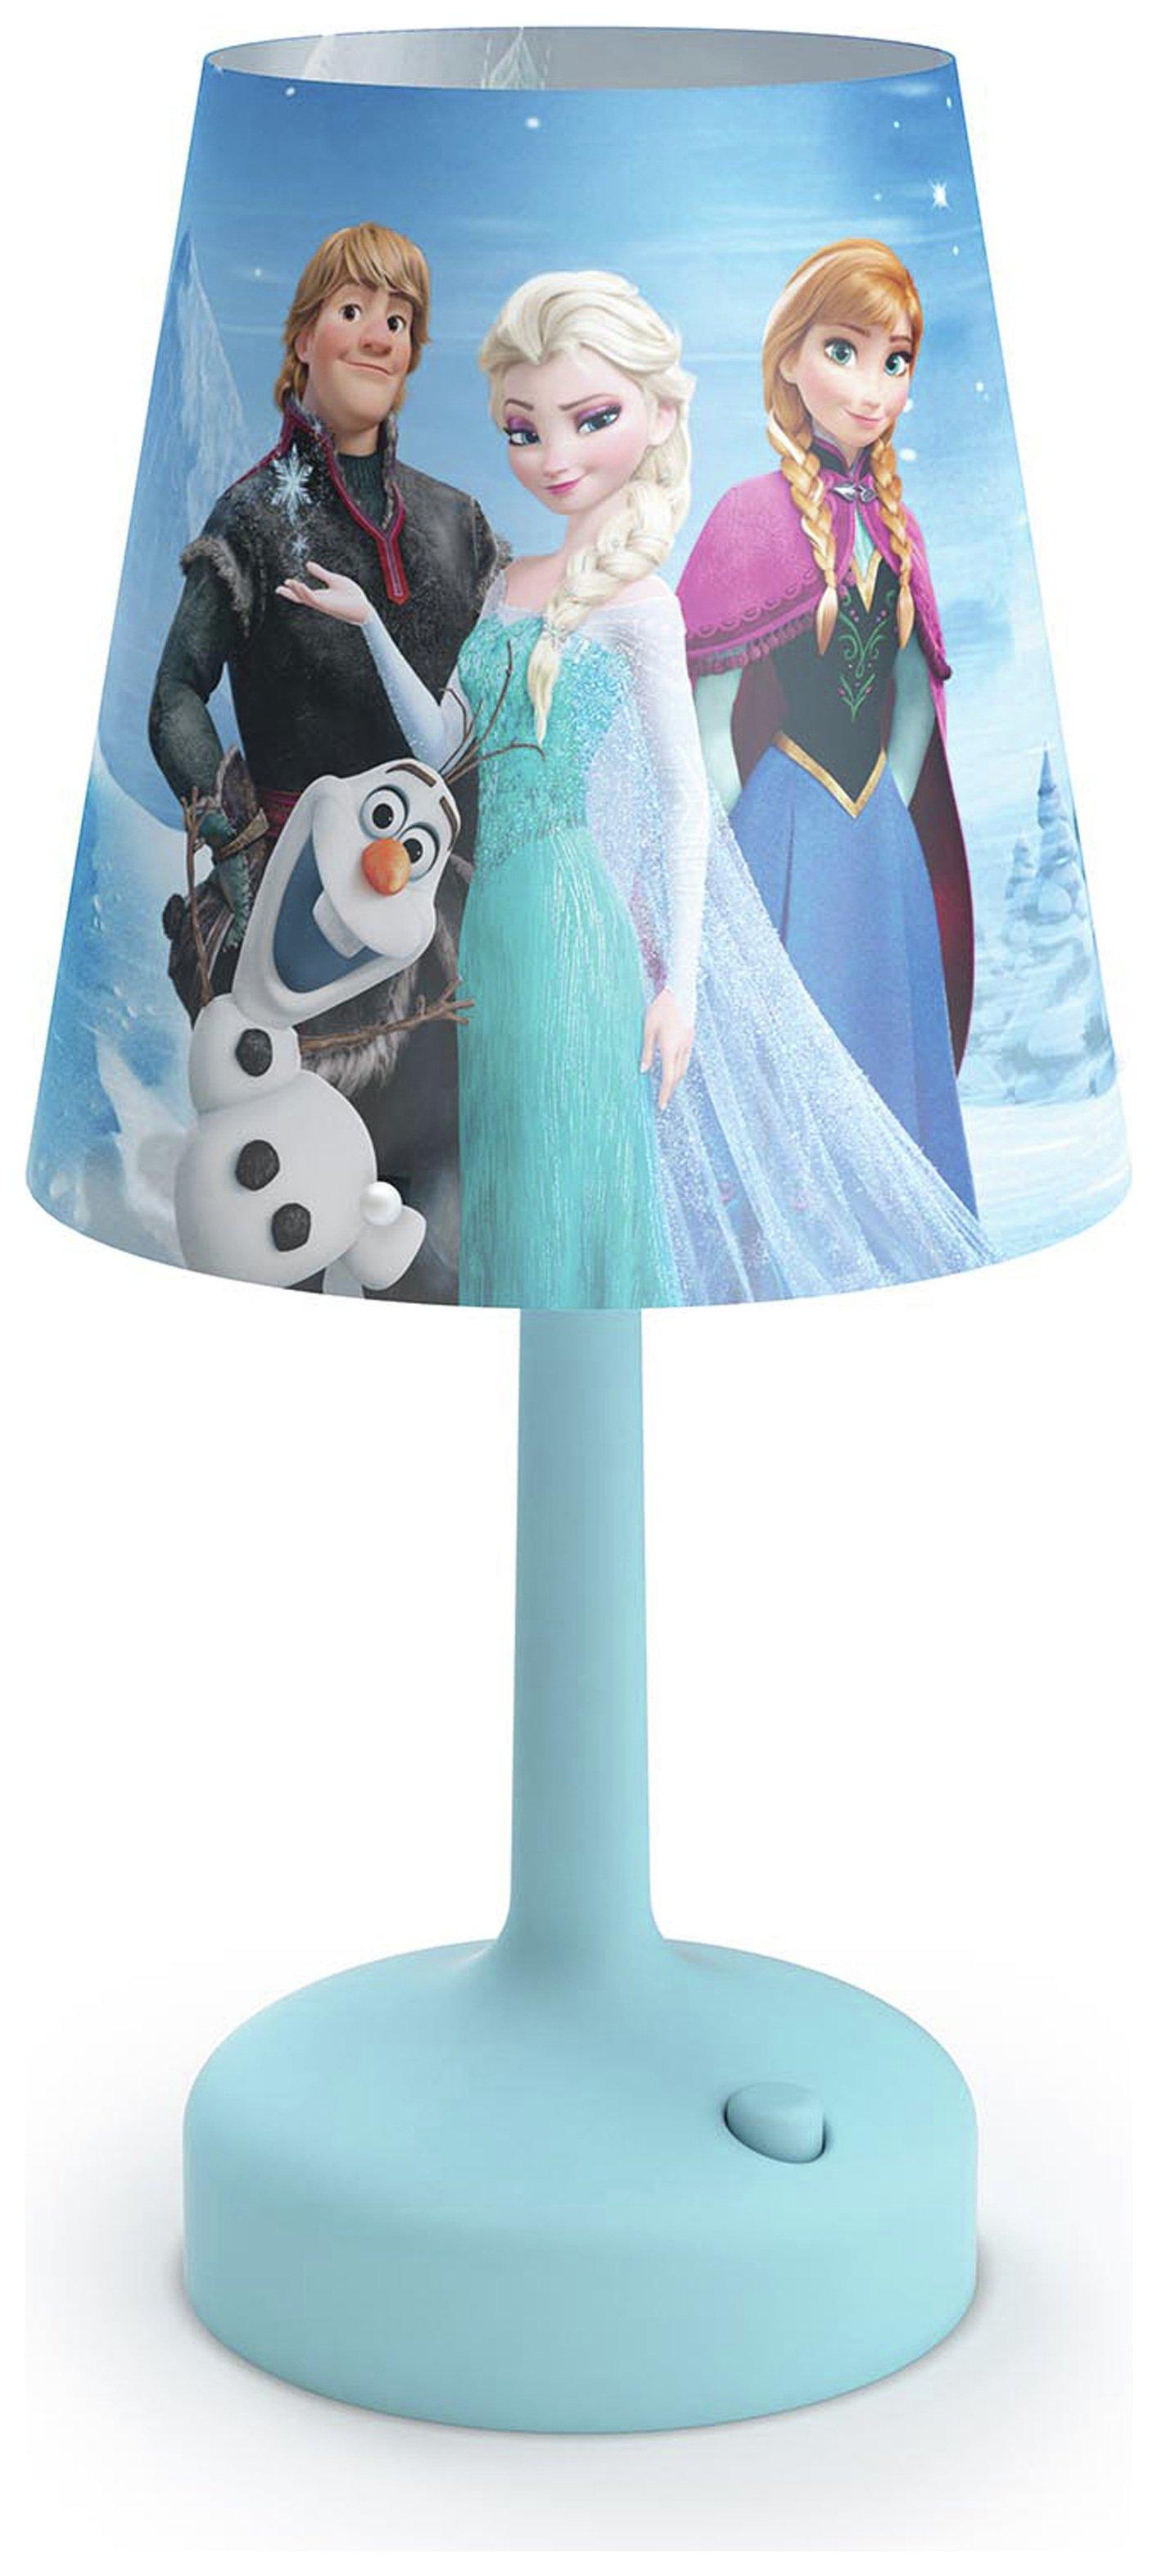 Image of Philips - Disney Frozen - Table Lamp - Blue